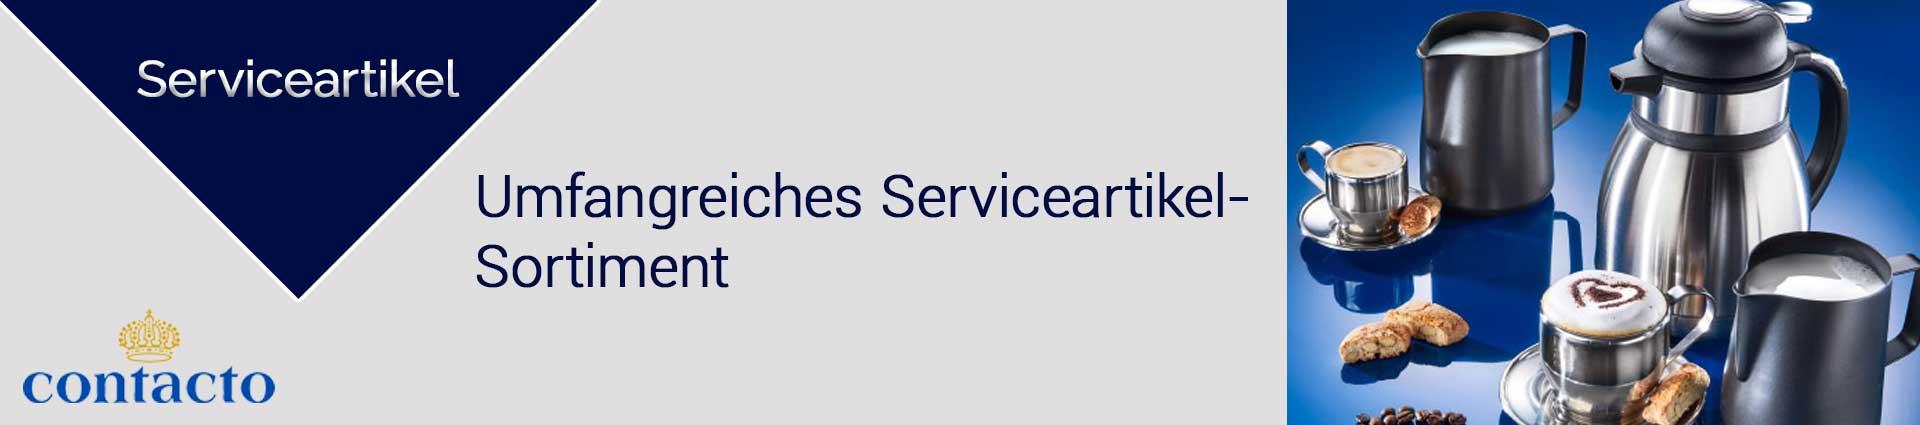 Contacto Serviceartikel Banner